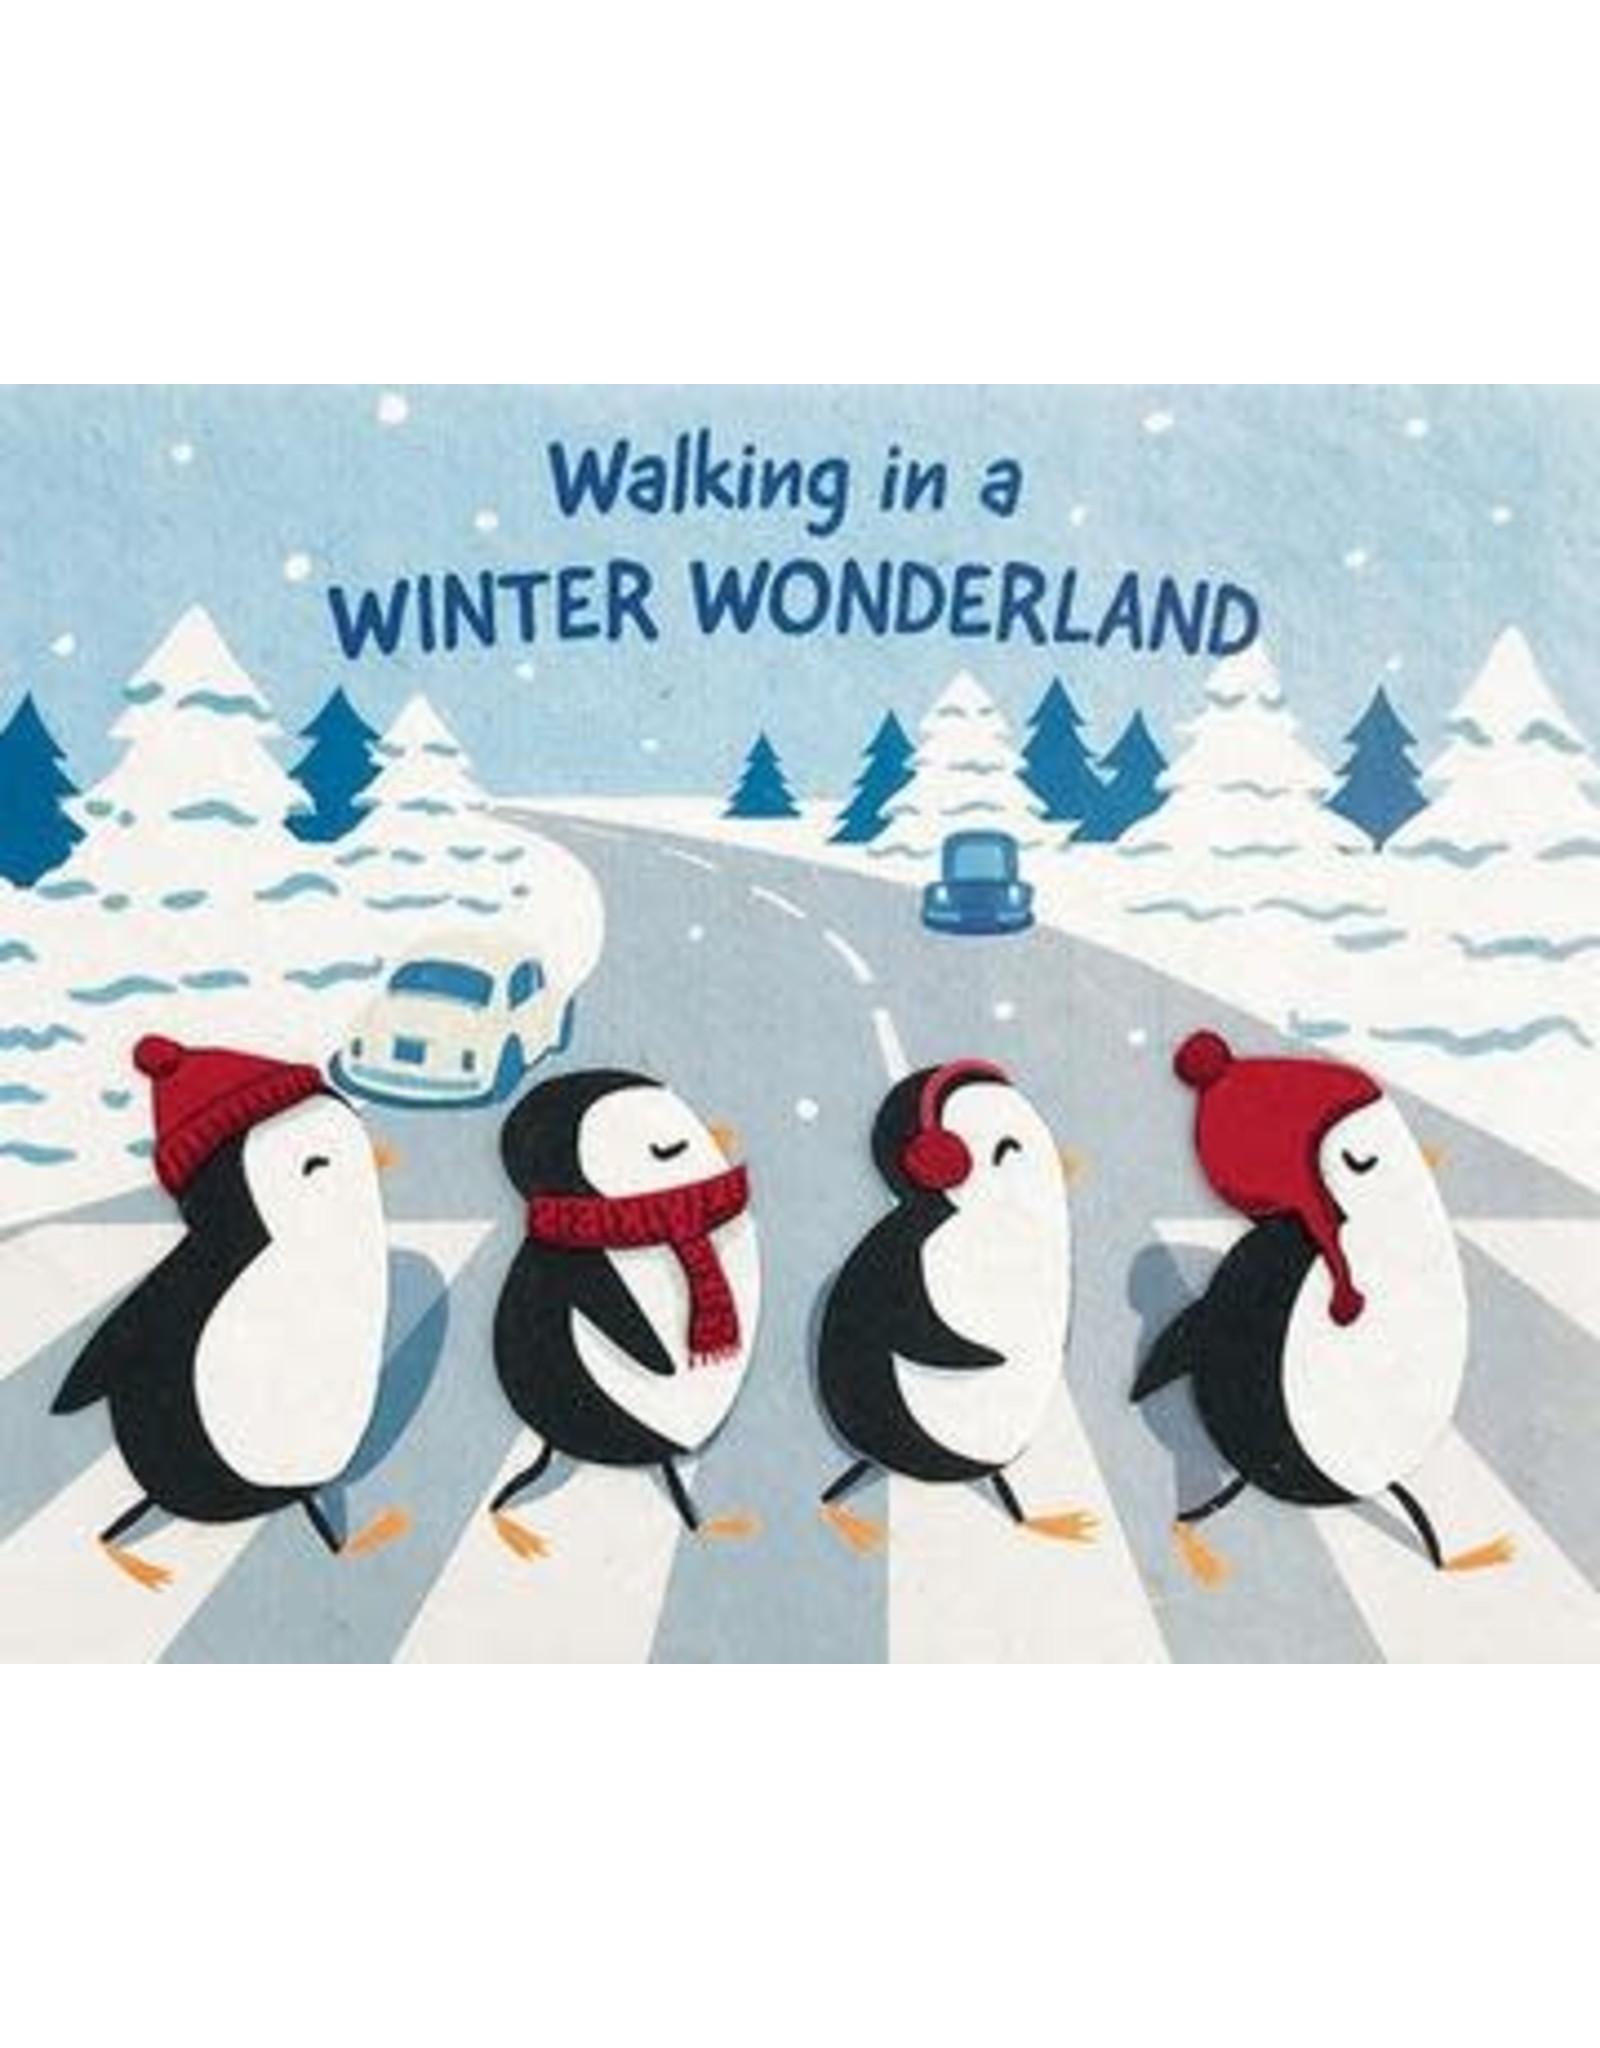 Good Paper Winter Wonderland Greeting Card, Philippines